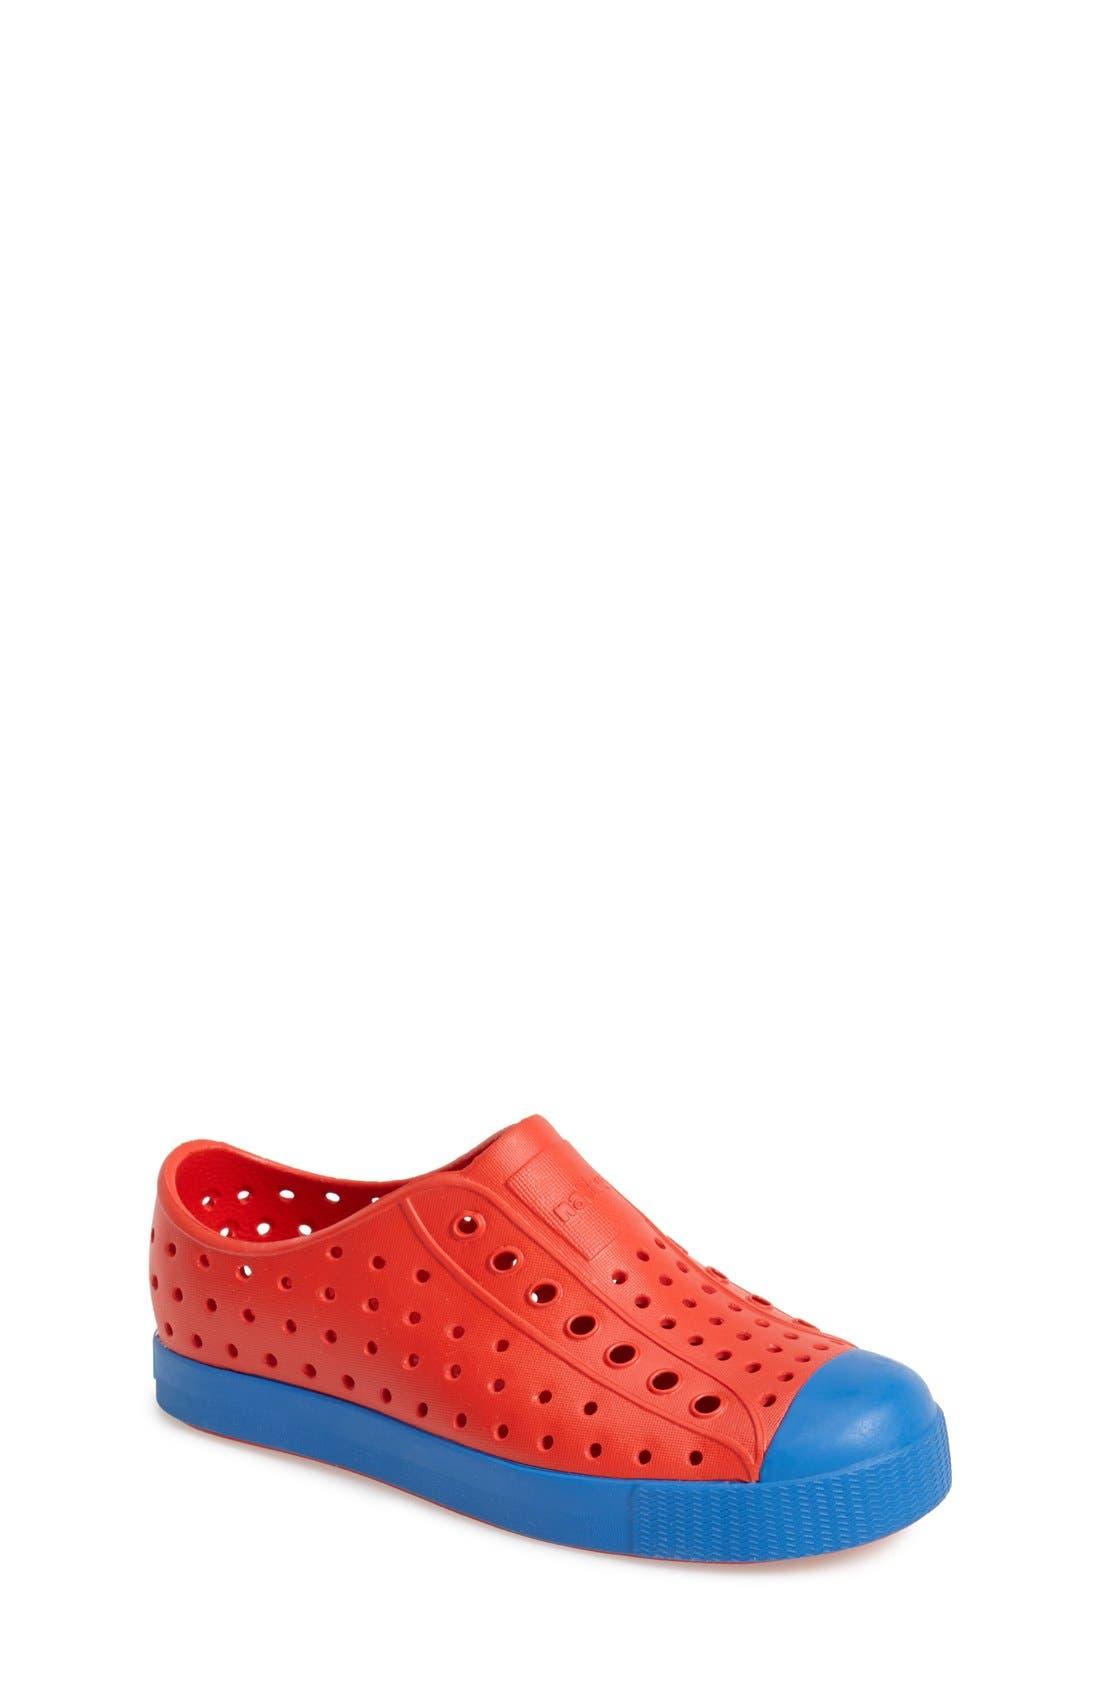 'Jefferson' Water Friendly Slip-On Sneaker,                             Main thumbnail 59, color,